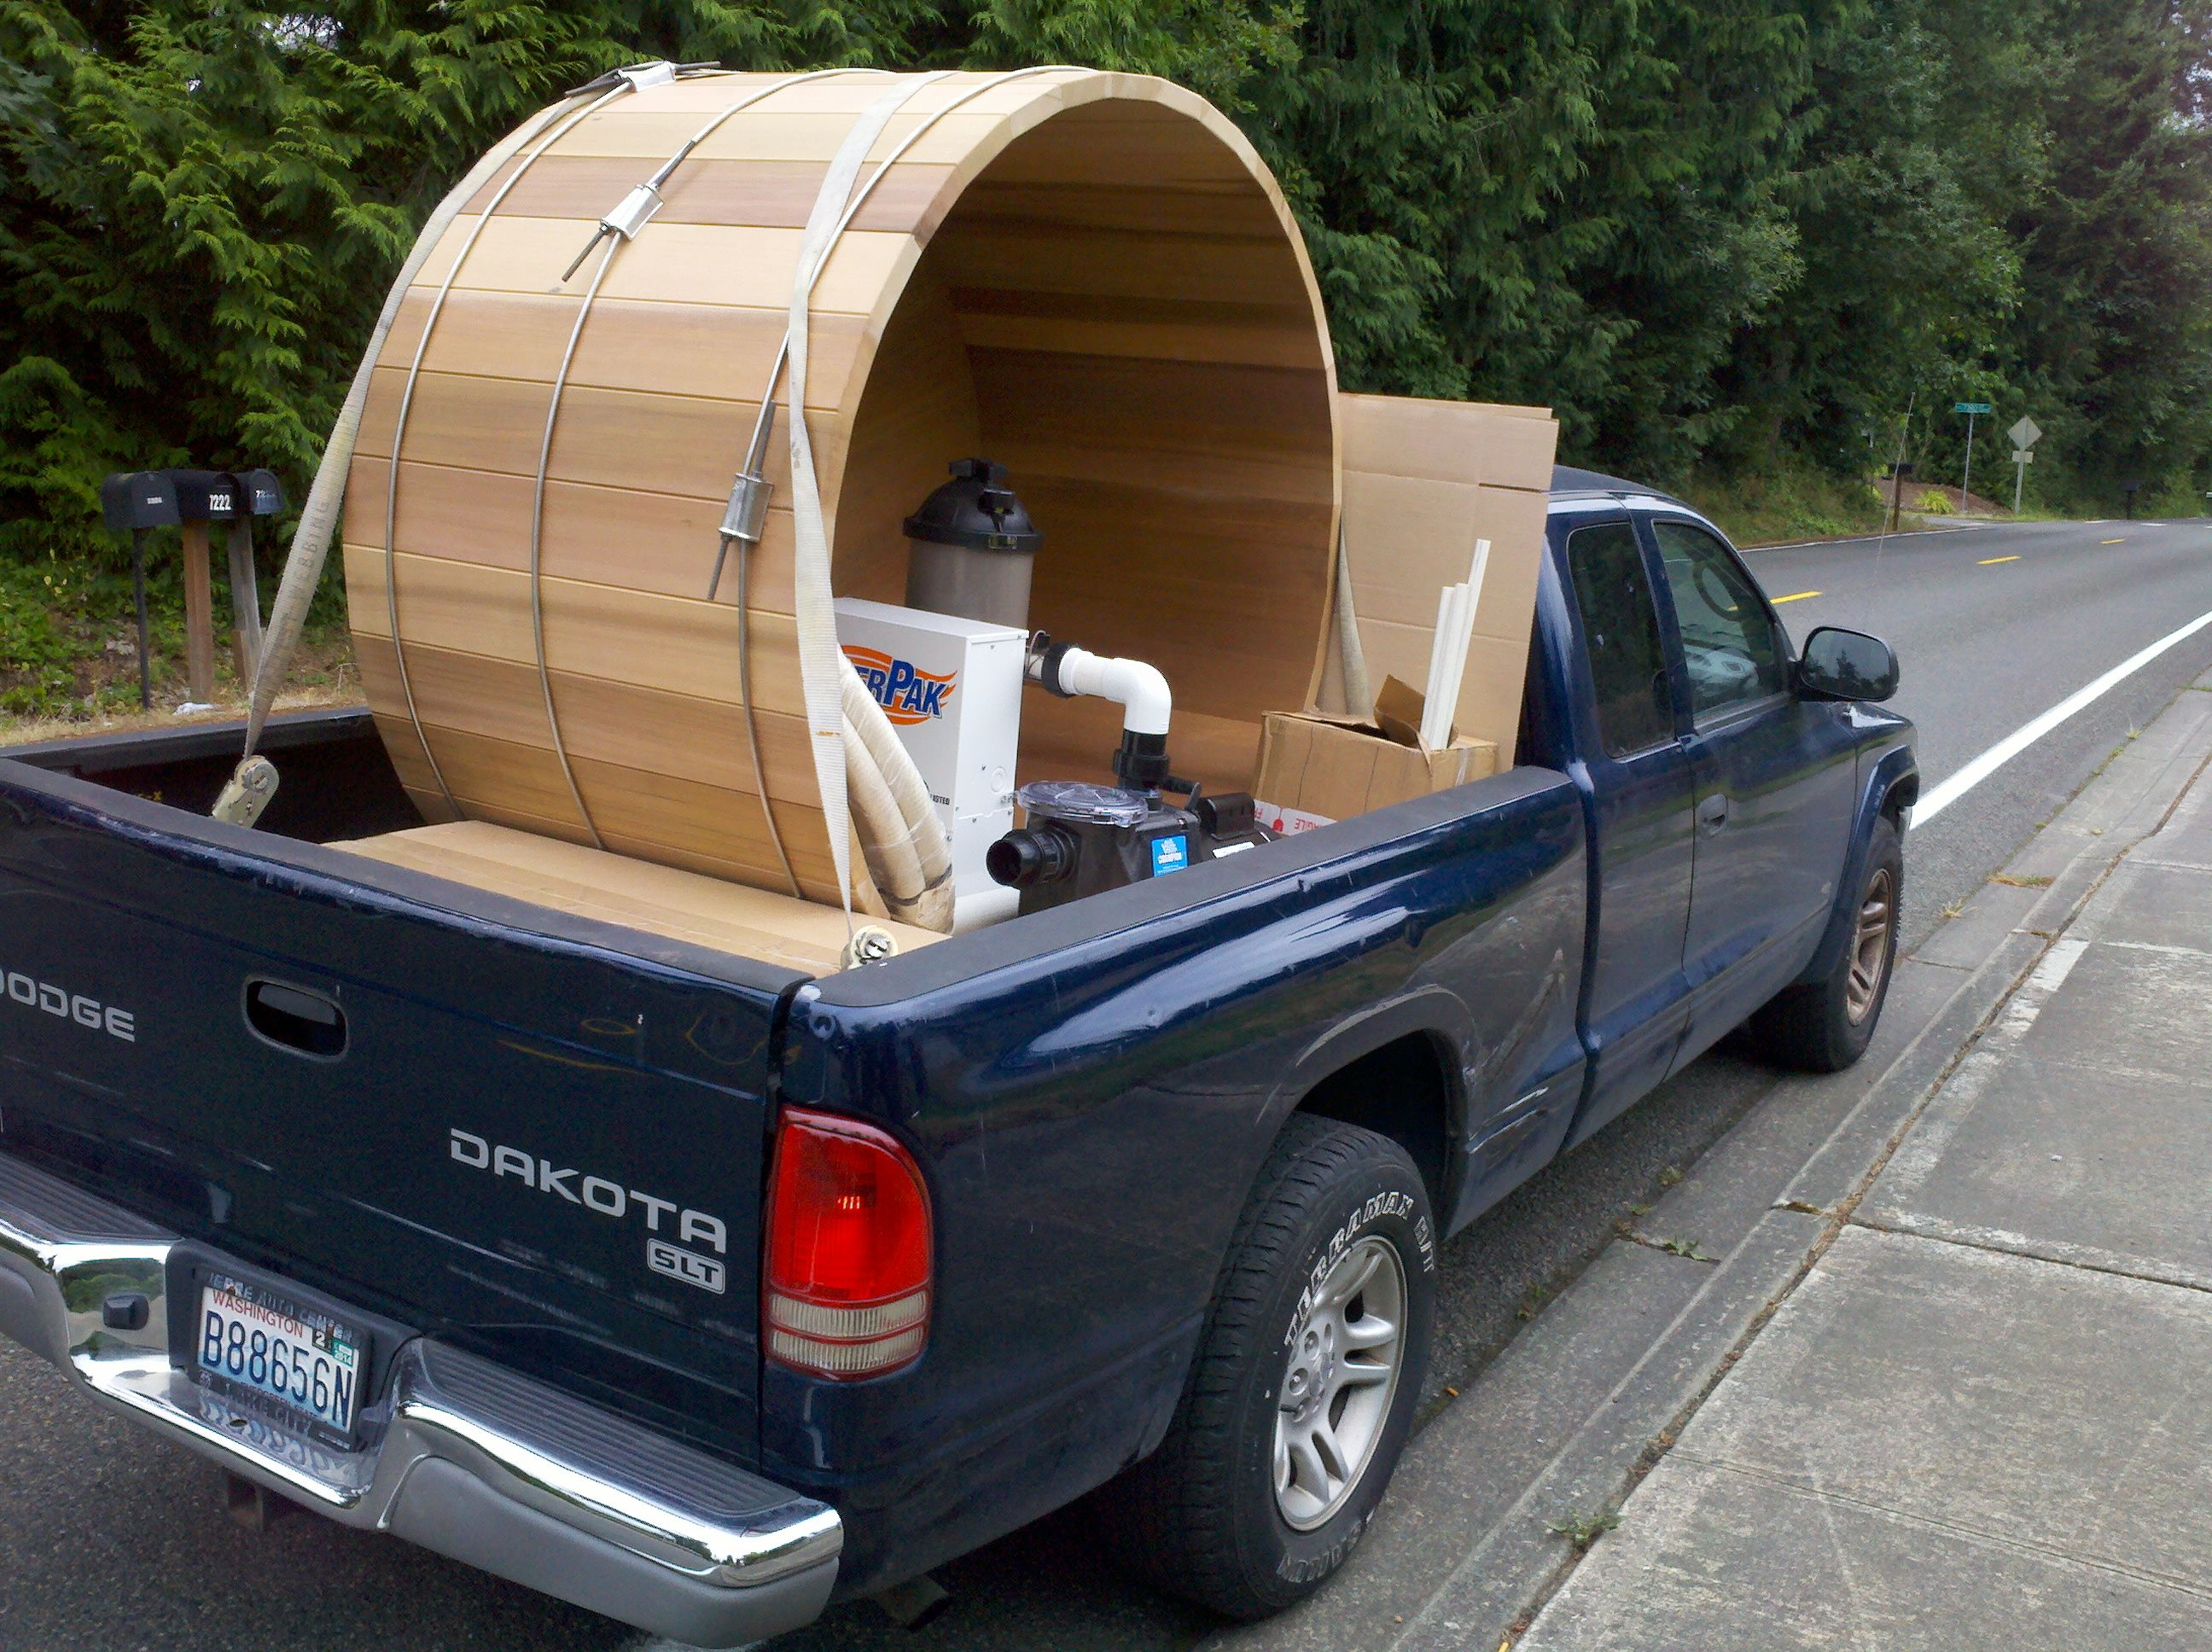 6 Diameter X 3 High Wood Barrel Hot Tub With Power Pak Being